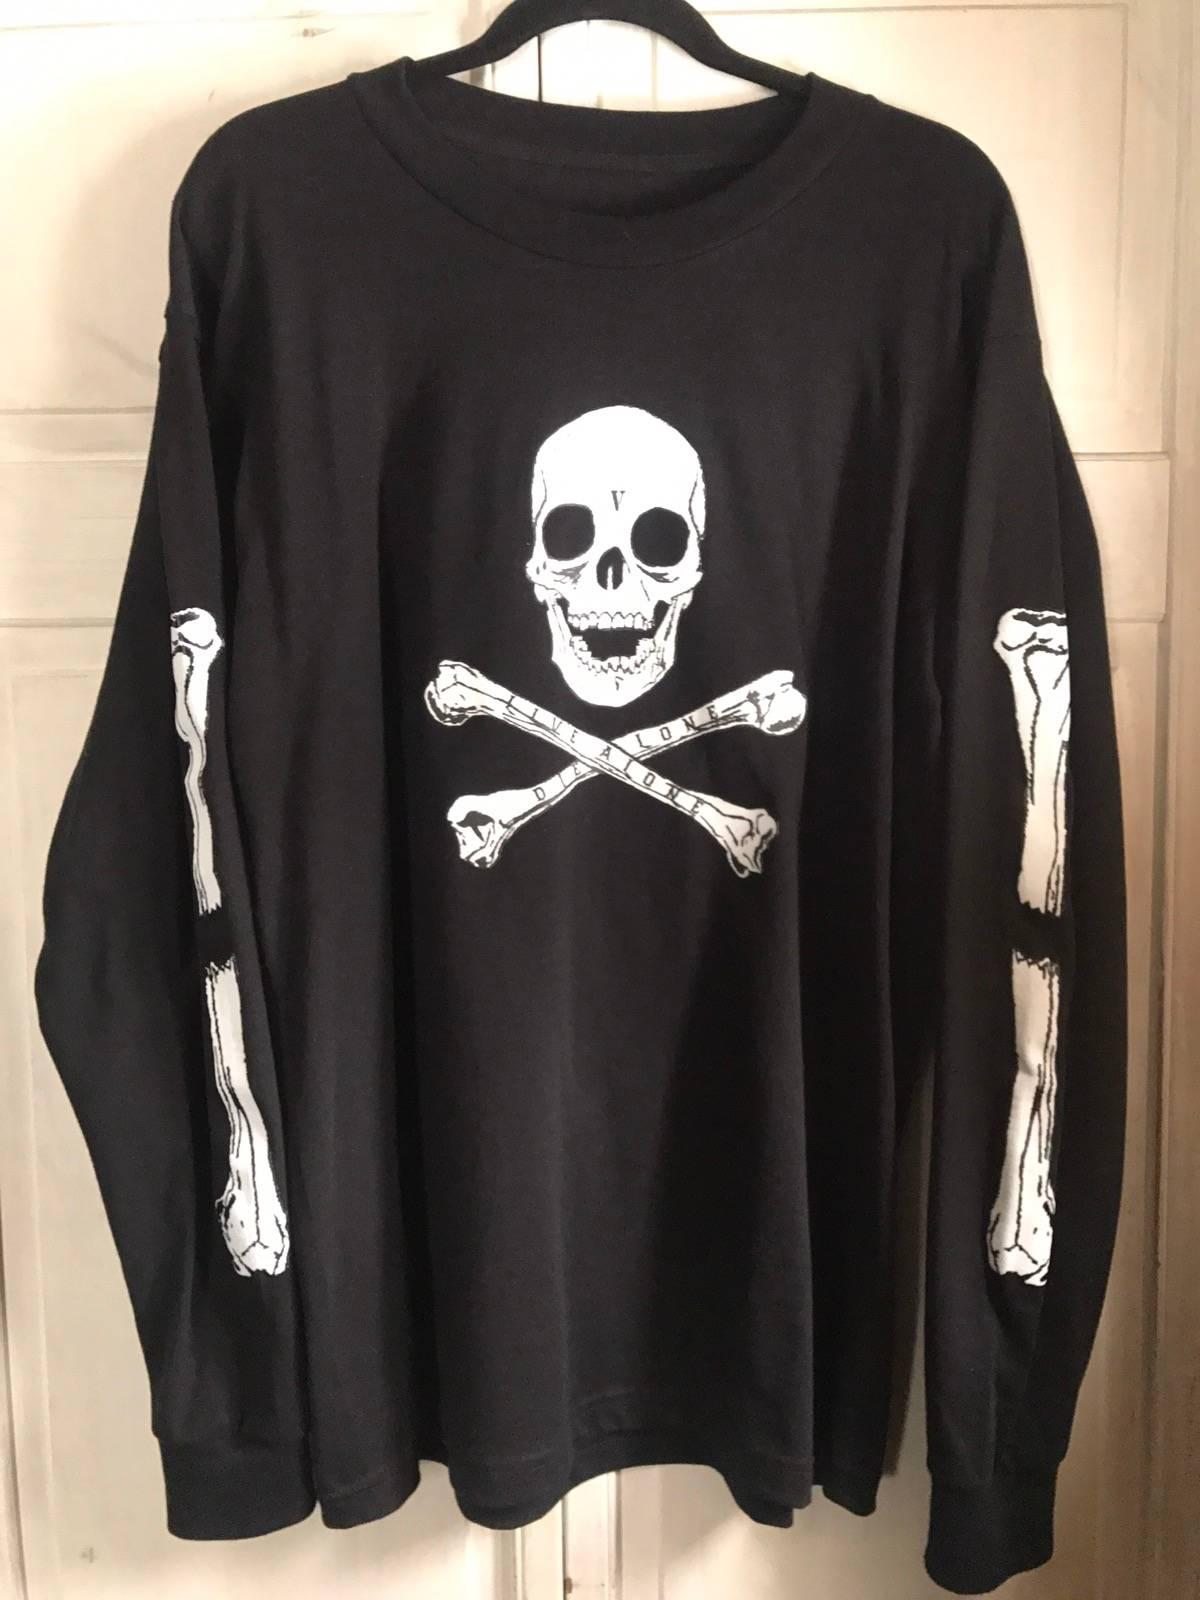 Vlone Vlone Black Friday Skull and Bones LS Size l - Long Sleeve T ... 602d8ef0da6